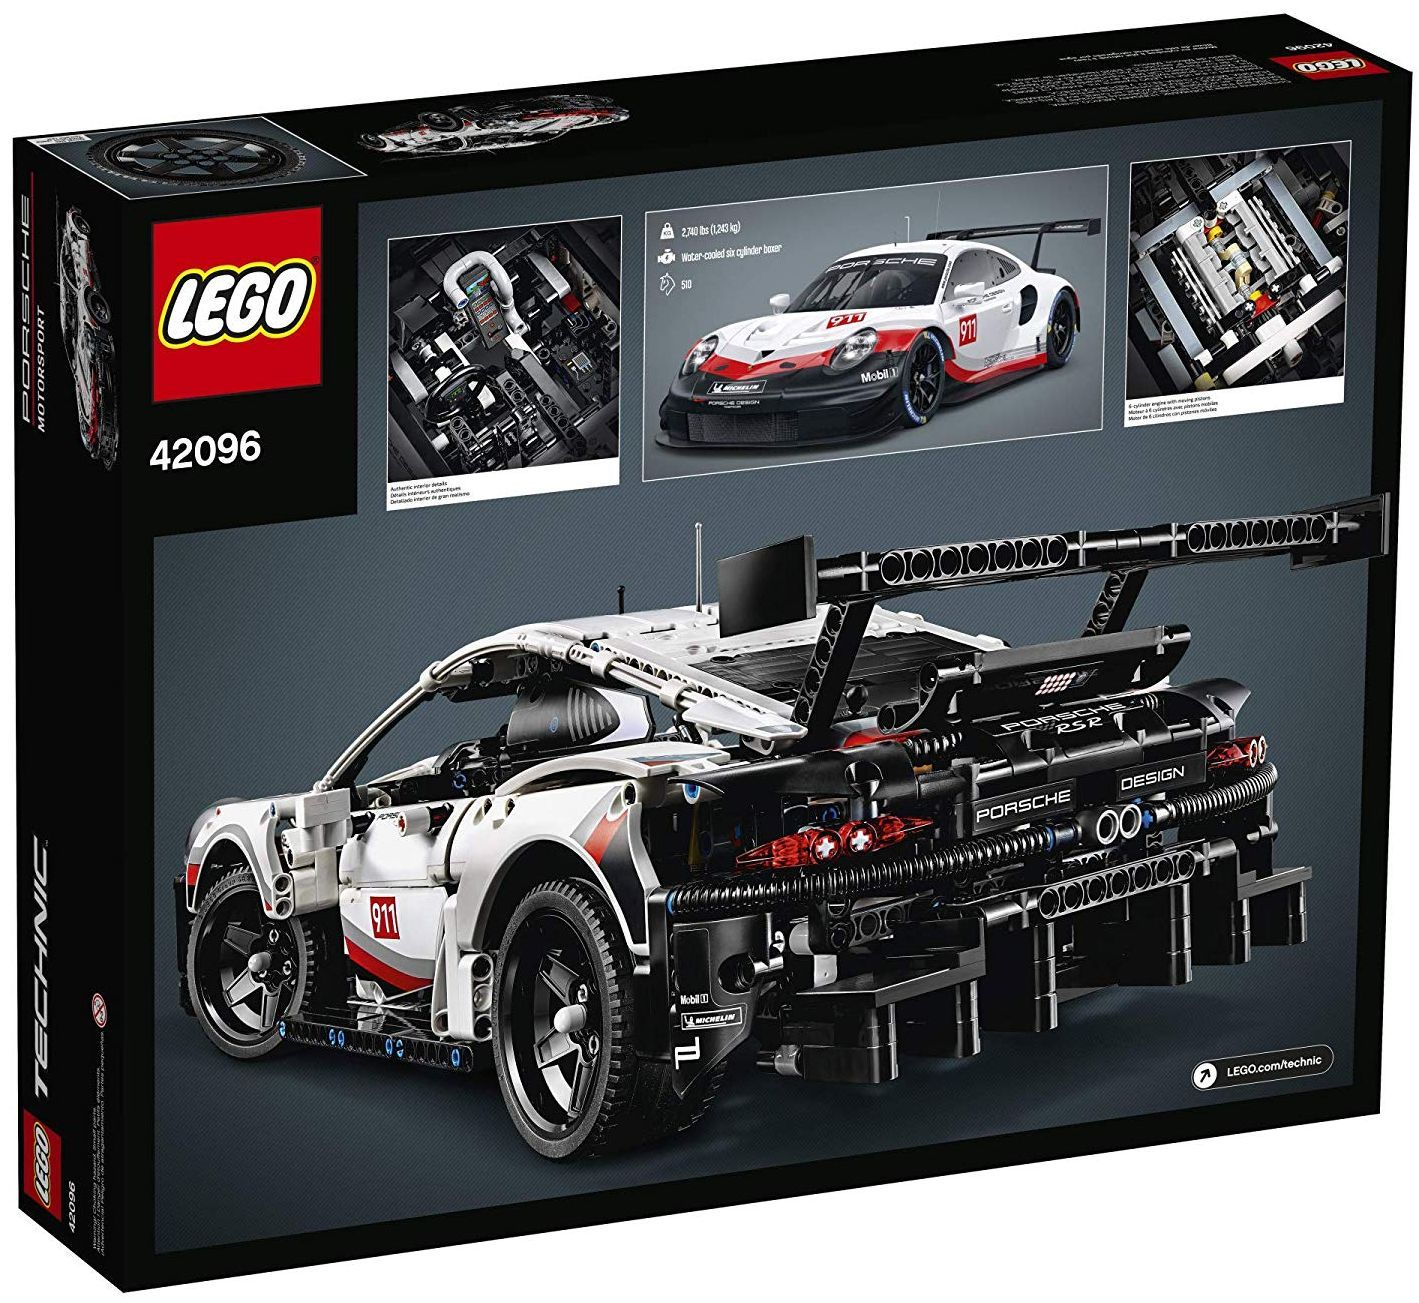 Конструктор Lego Technic - Porsche 911 RSR (42096) - 1